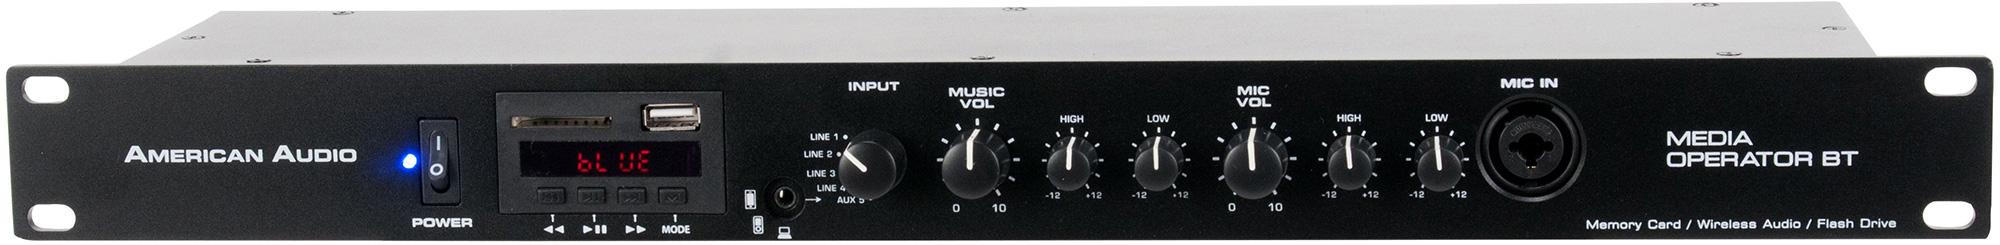 ADJ MED155 Media Operator All-in-One MP3/Wireless Audio Media Player AMDJ-MED155